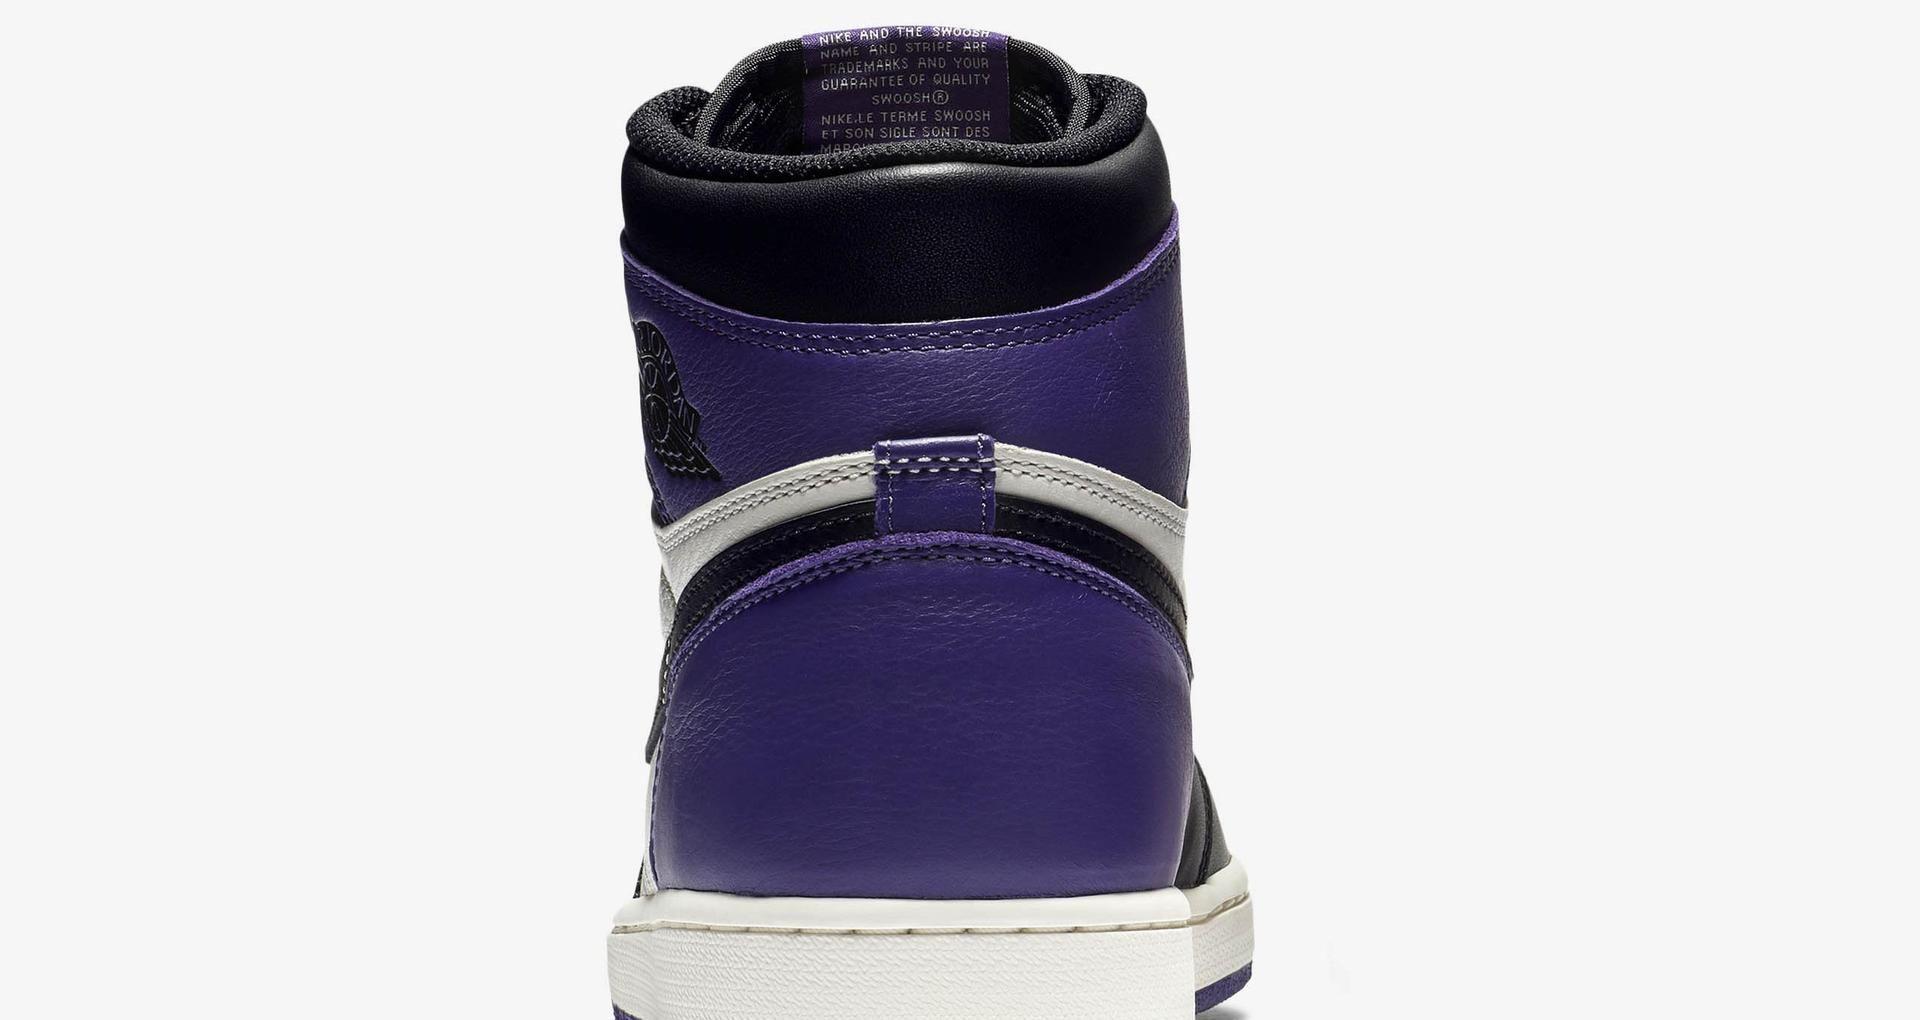 0d311ce3b46a Air Jordan 1 Retro  Court Purple  Release Date. Nike+ SNKRS